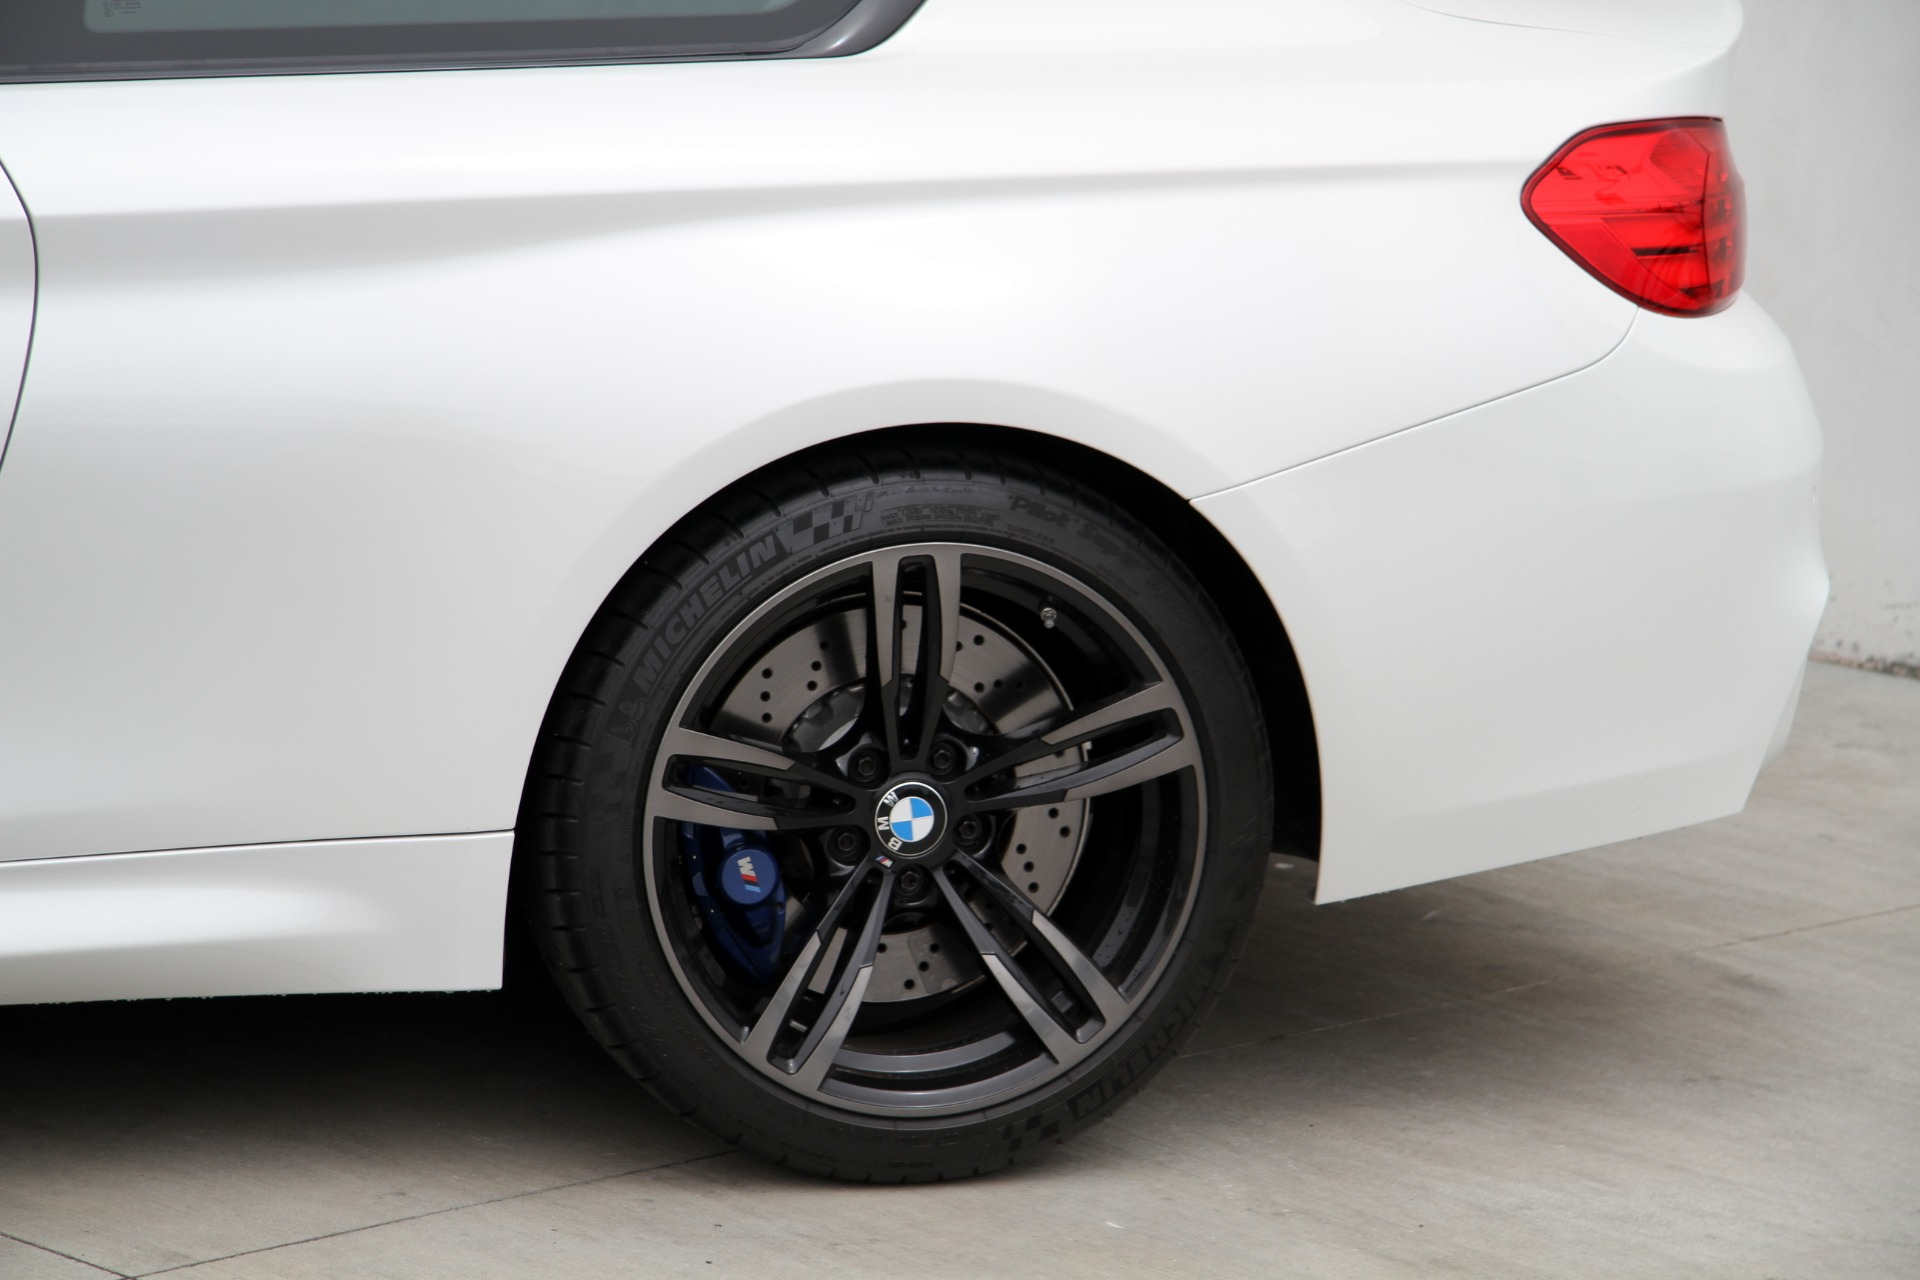 2015 Bmw M4 Carbon Fiber Roof Stock 6151 For Sale